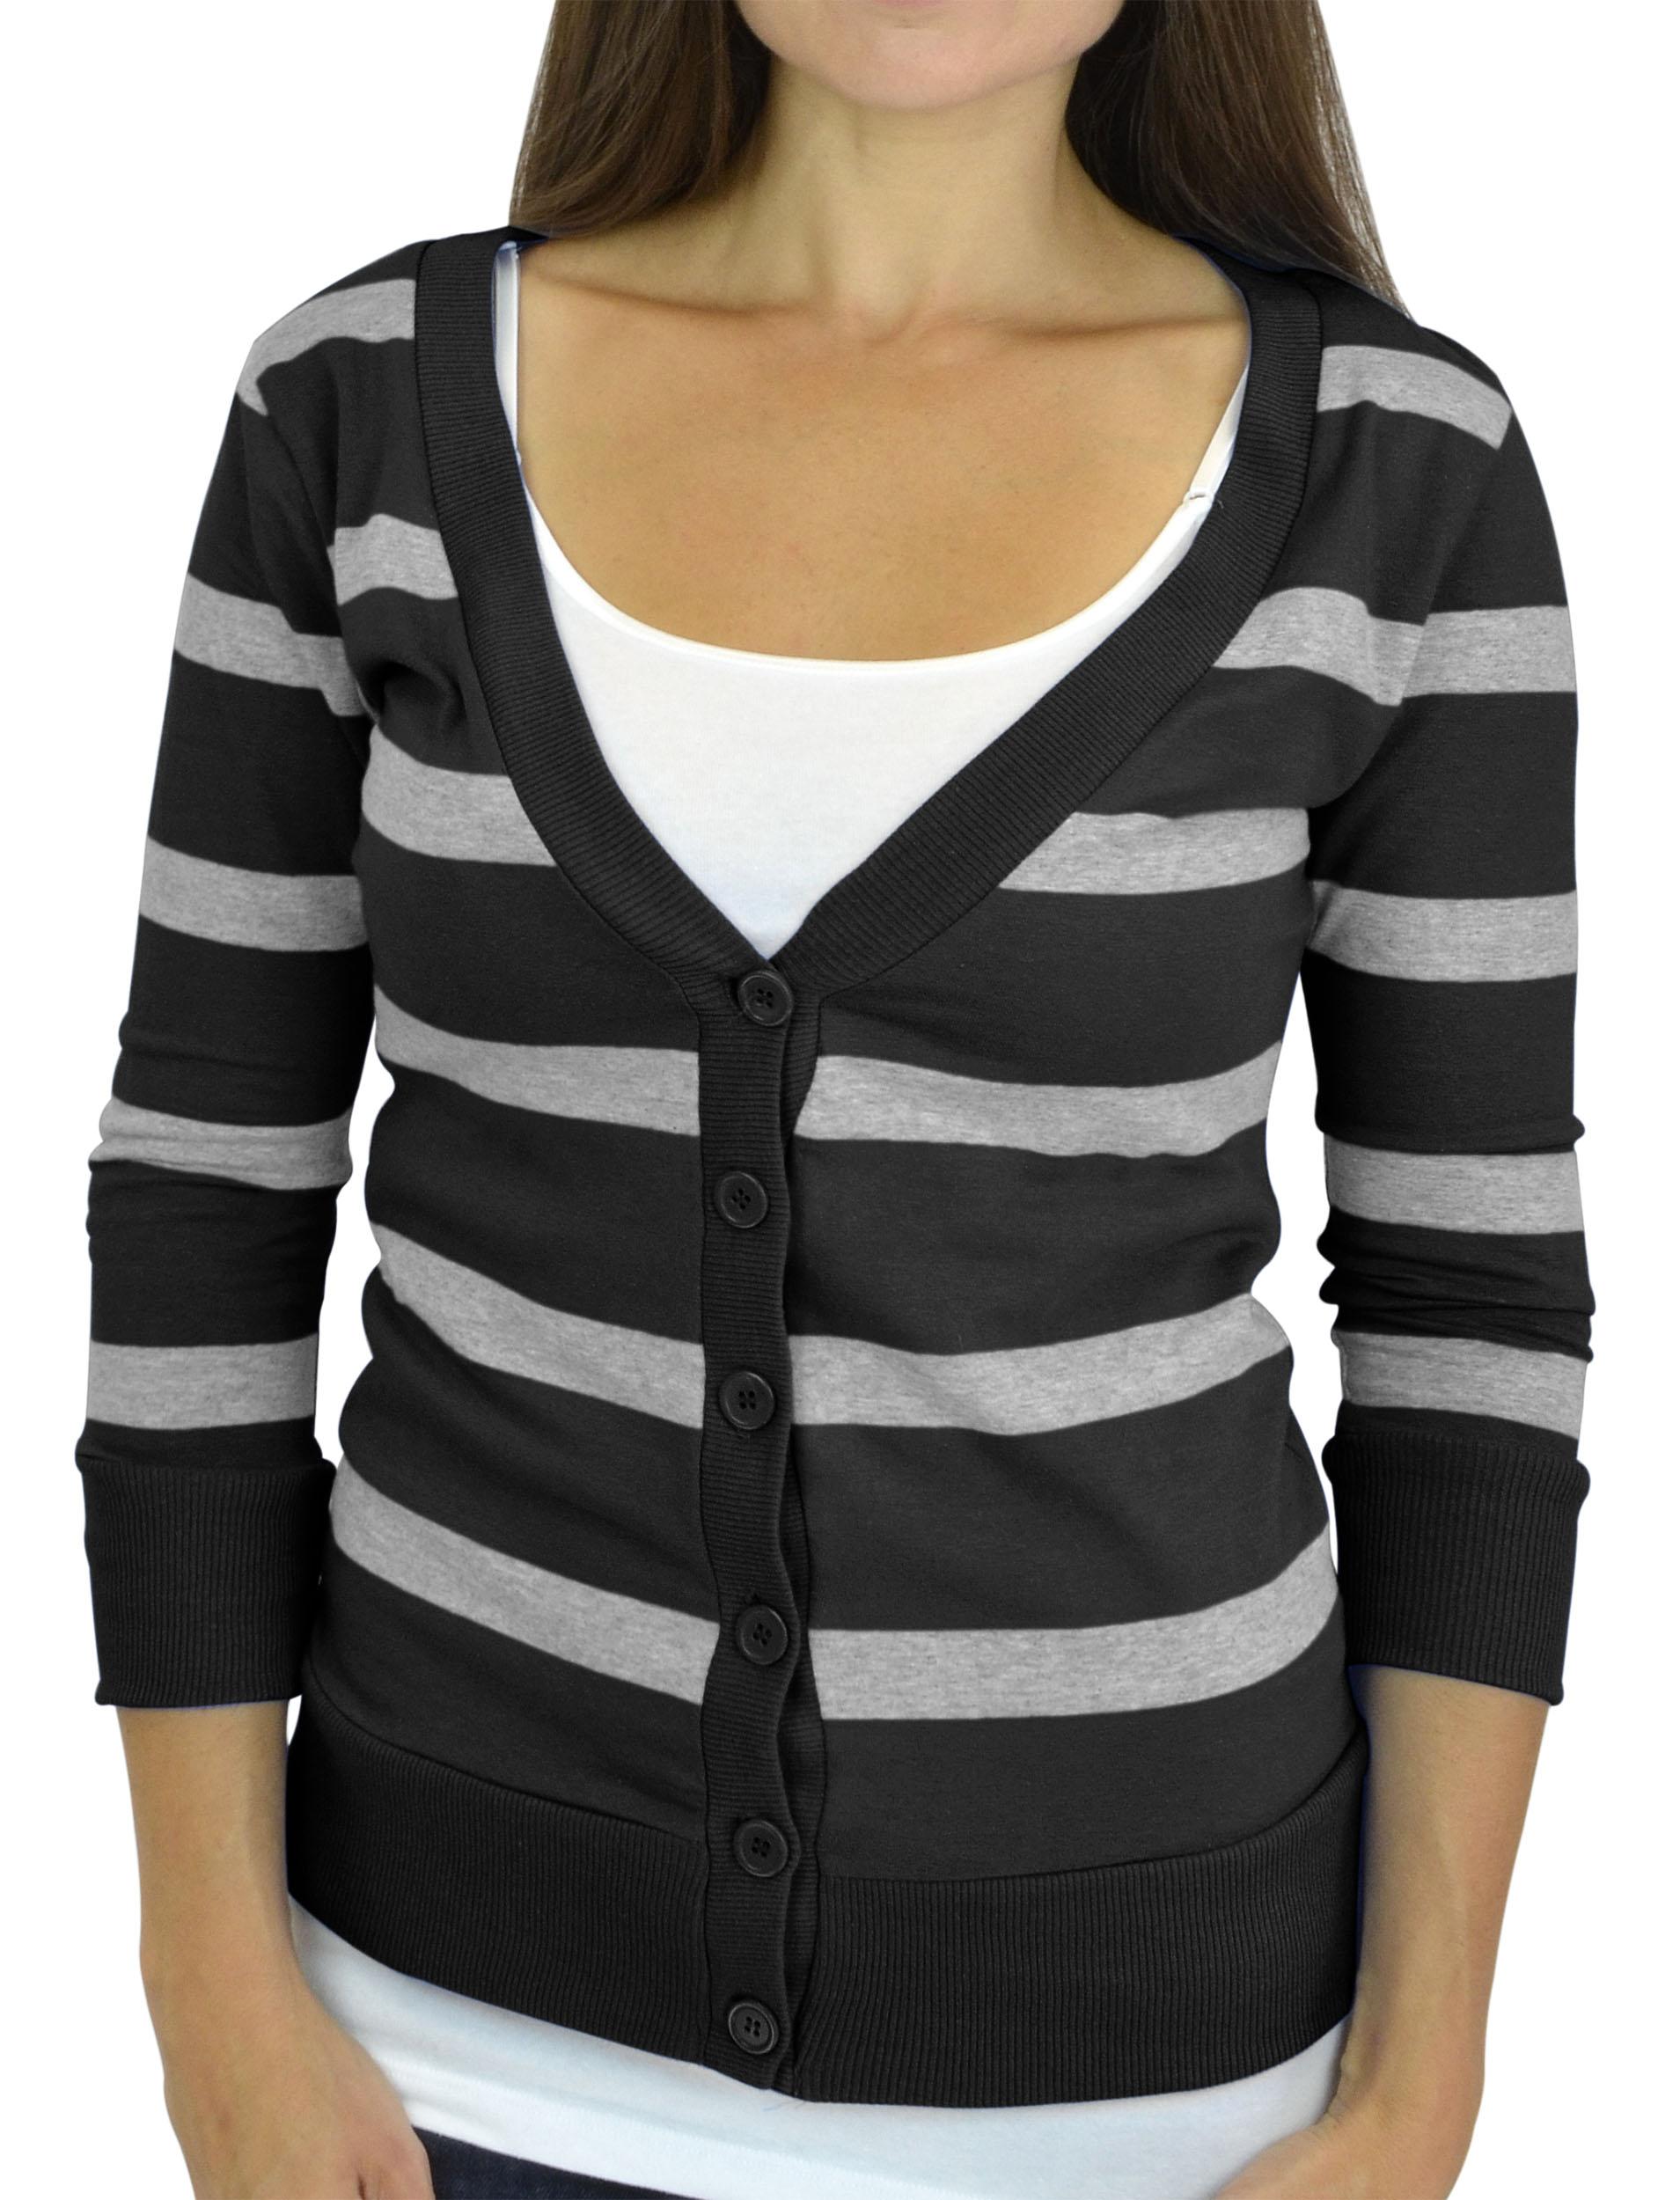 Belle Donne - Women / Girl Junior Size Soft 3/4 Sleeve V-Neck Sweater Cardigans - Charcoal/Medium